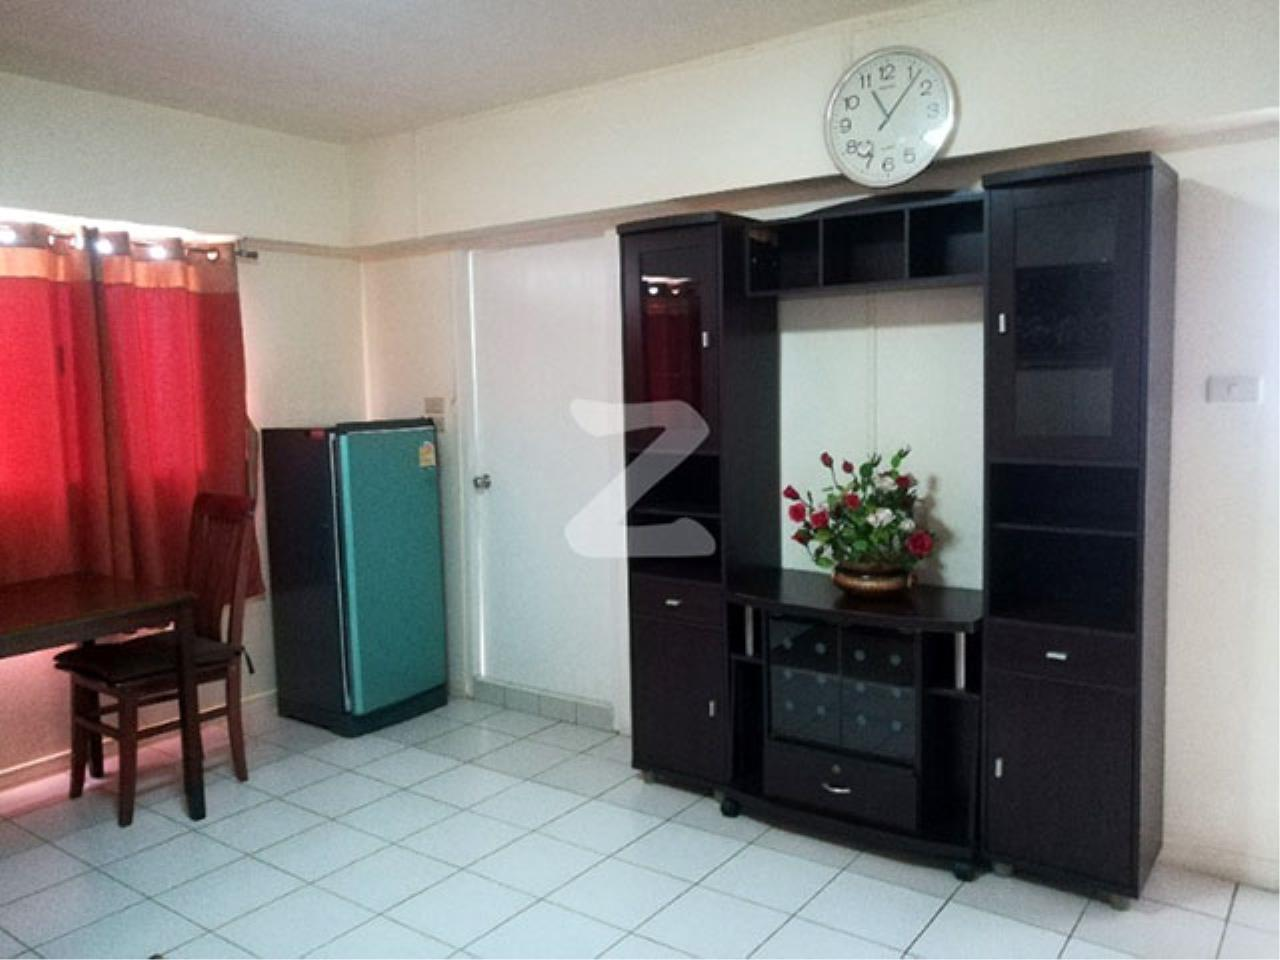 Agent - Sarunya jantanakorn Agency's BE0034 Condo for Sale Lumpini Center Happyland fl.6th 43 sqm 1 bed near The Mall Bangkapi 5